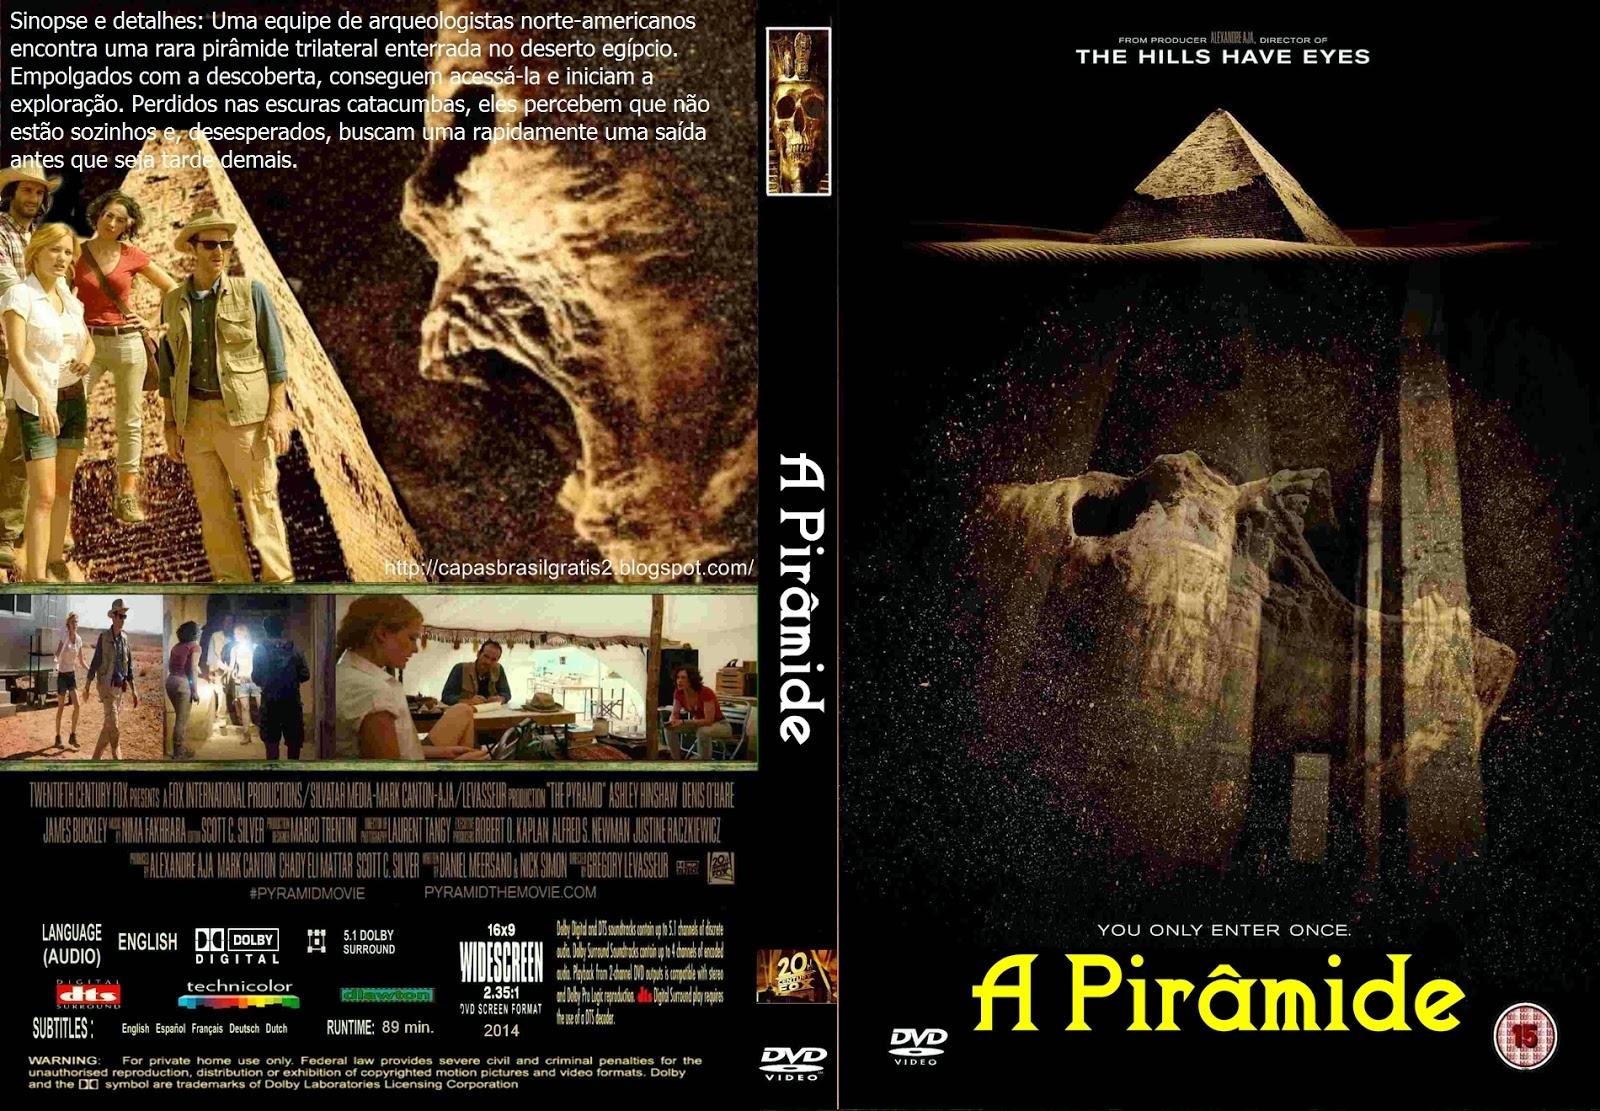 Download A Pirâmide BDRip XviD Dual Áudio A 2BPir C3 A2mide 2B02